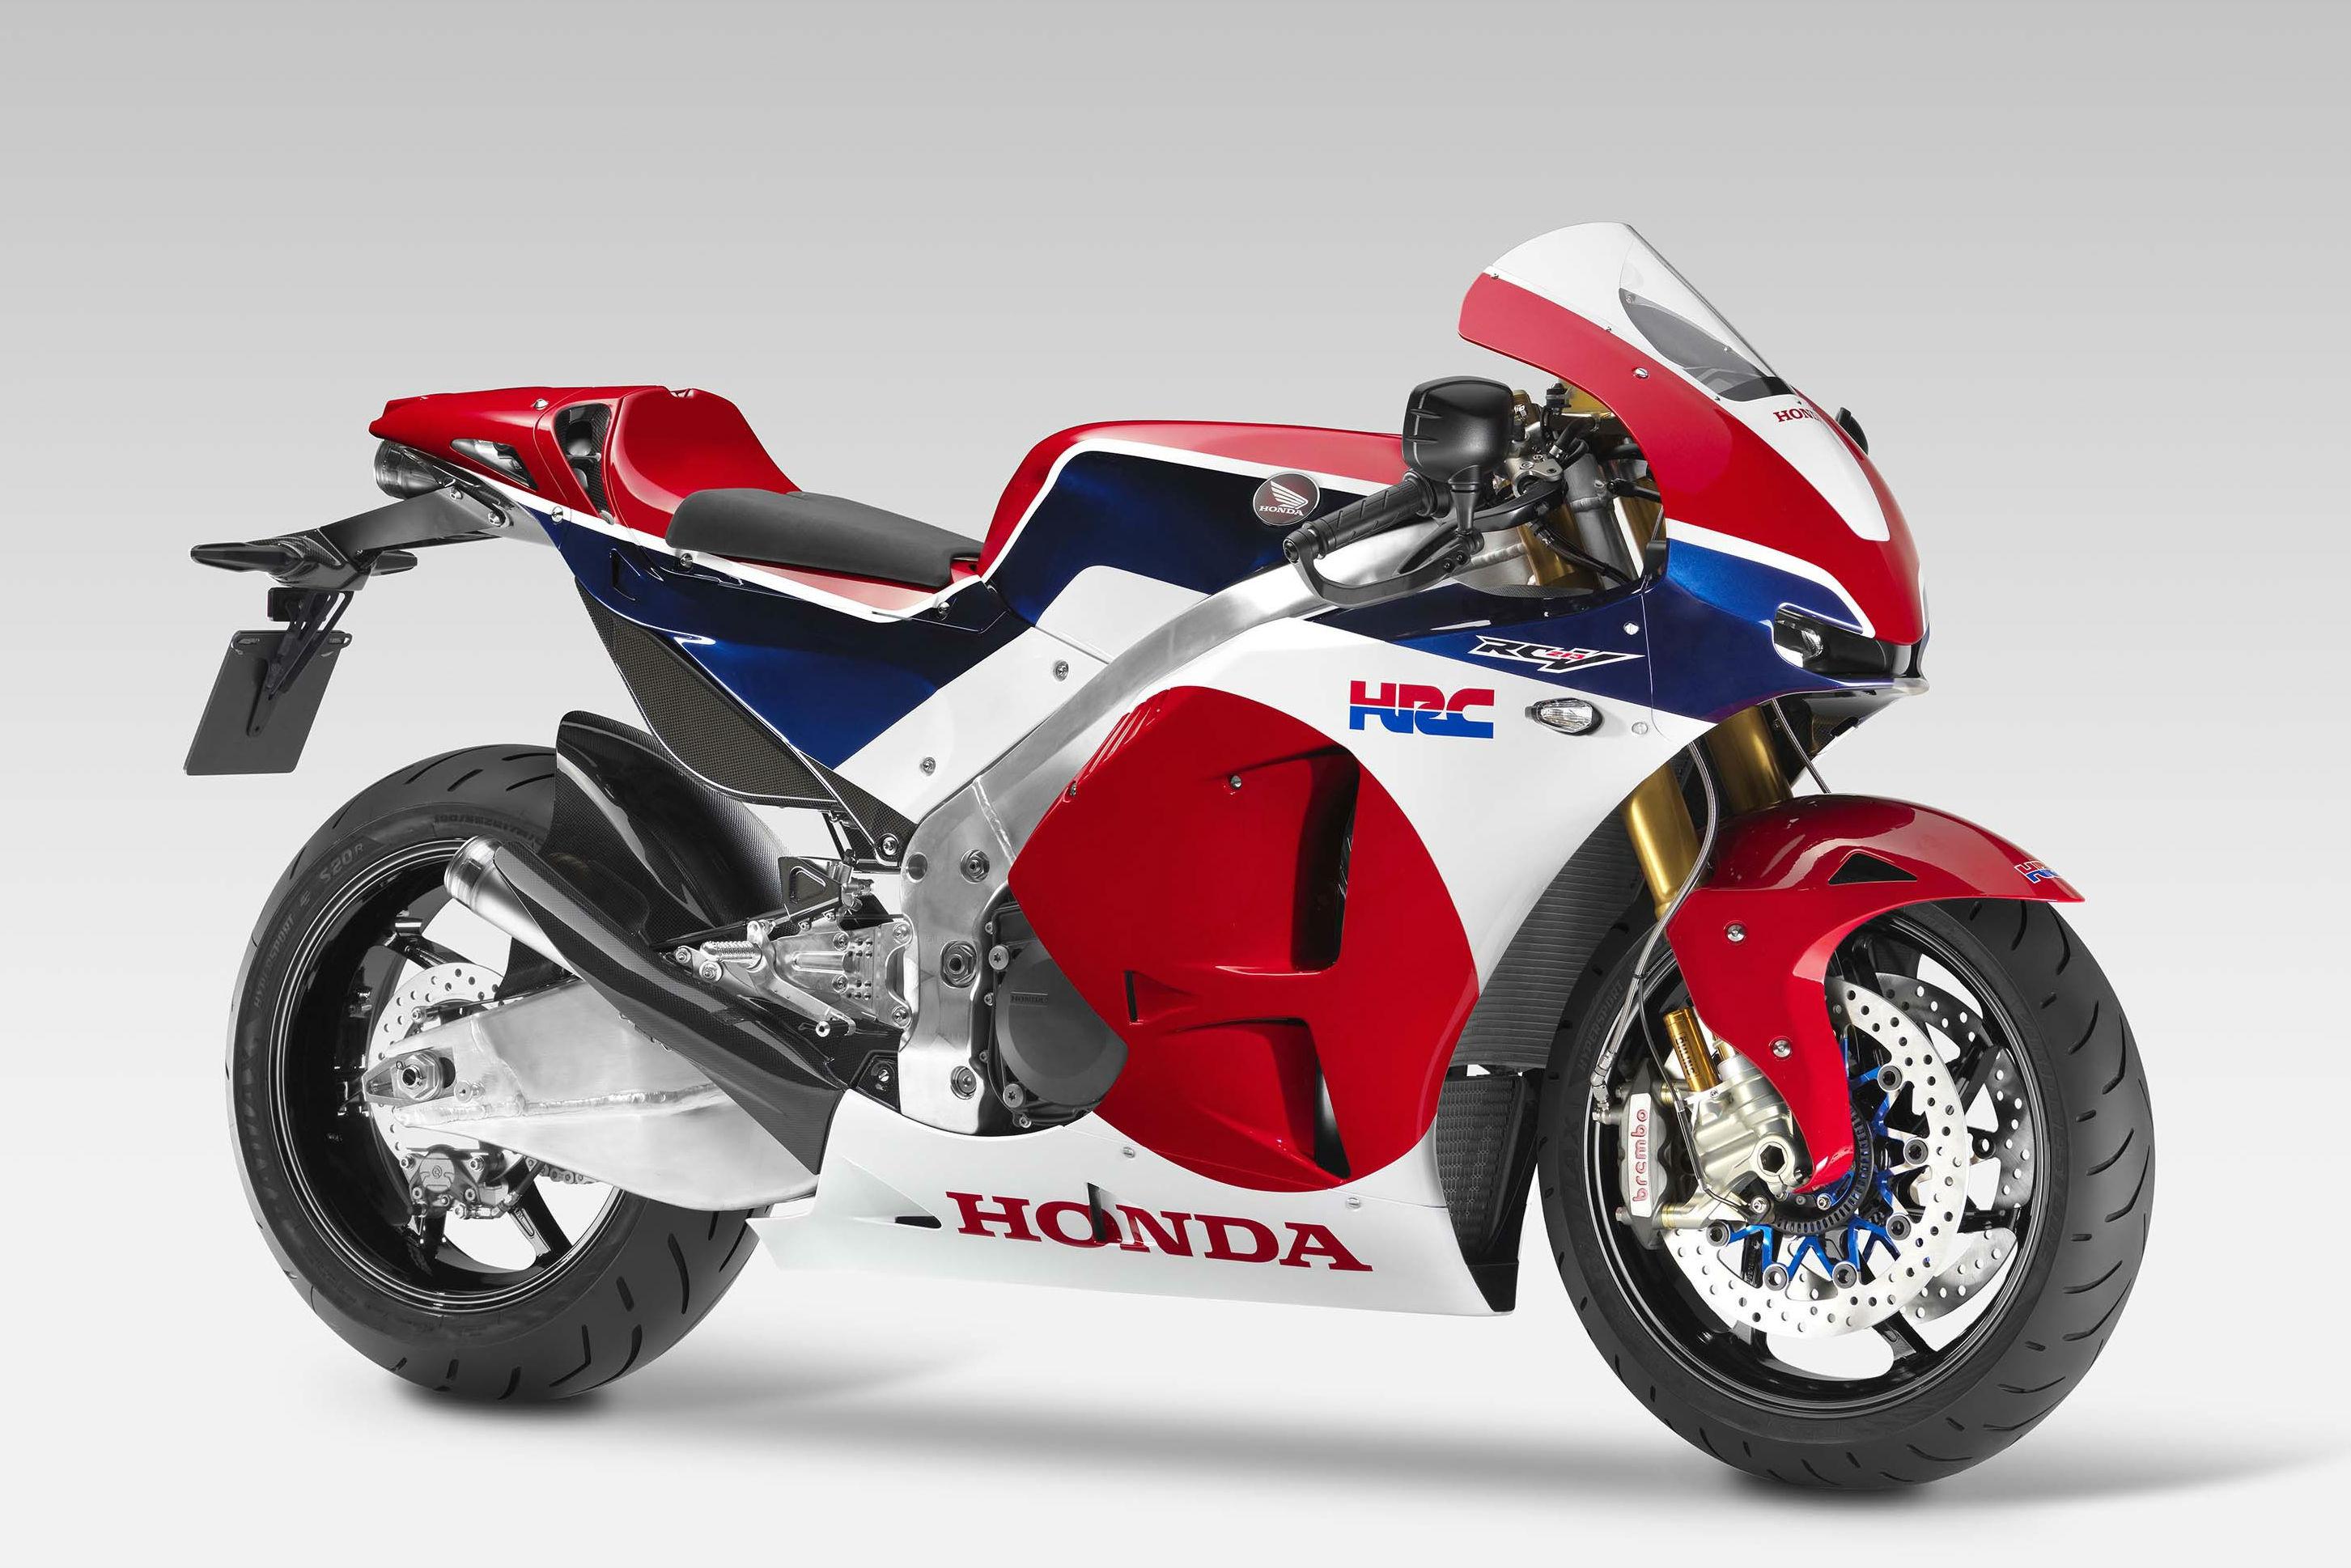 Honda RC213V-S priced at £112,000